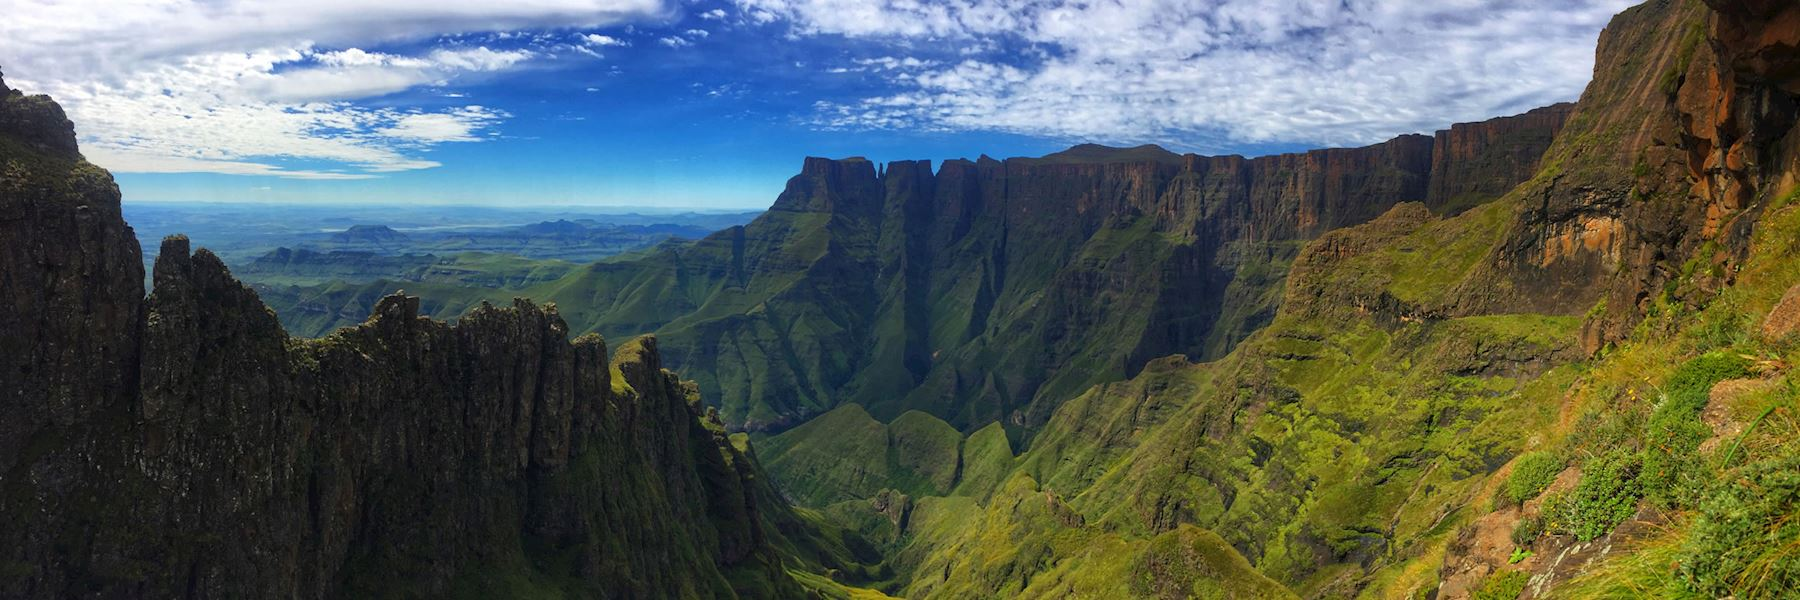 Visit the Drakensberg, South Africa